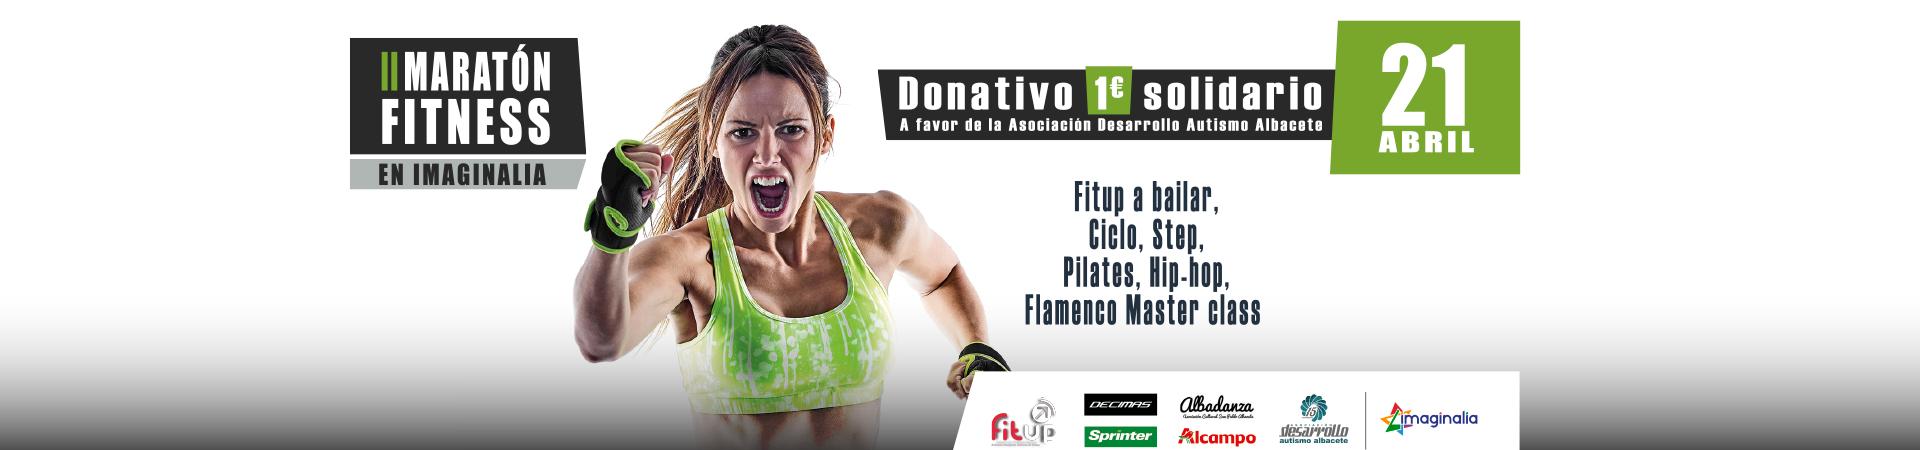 slider-maraton-fitness-2018